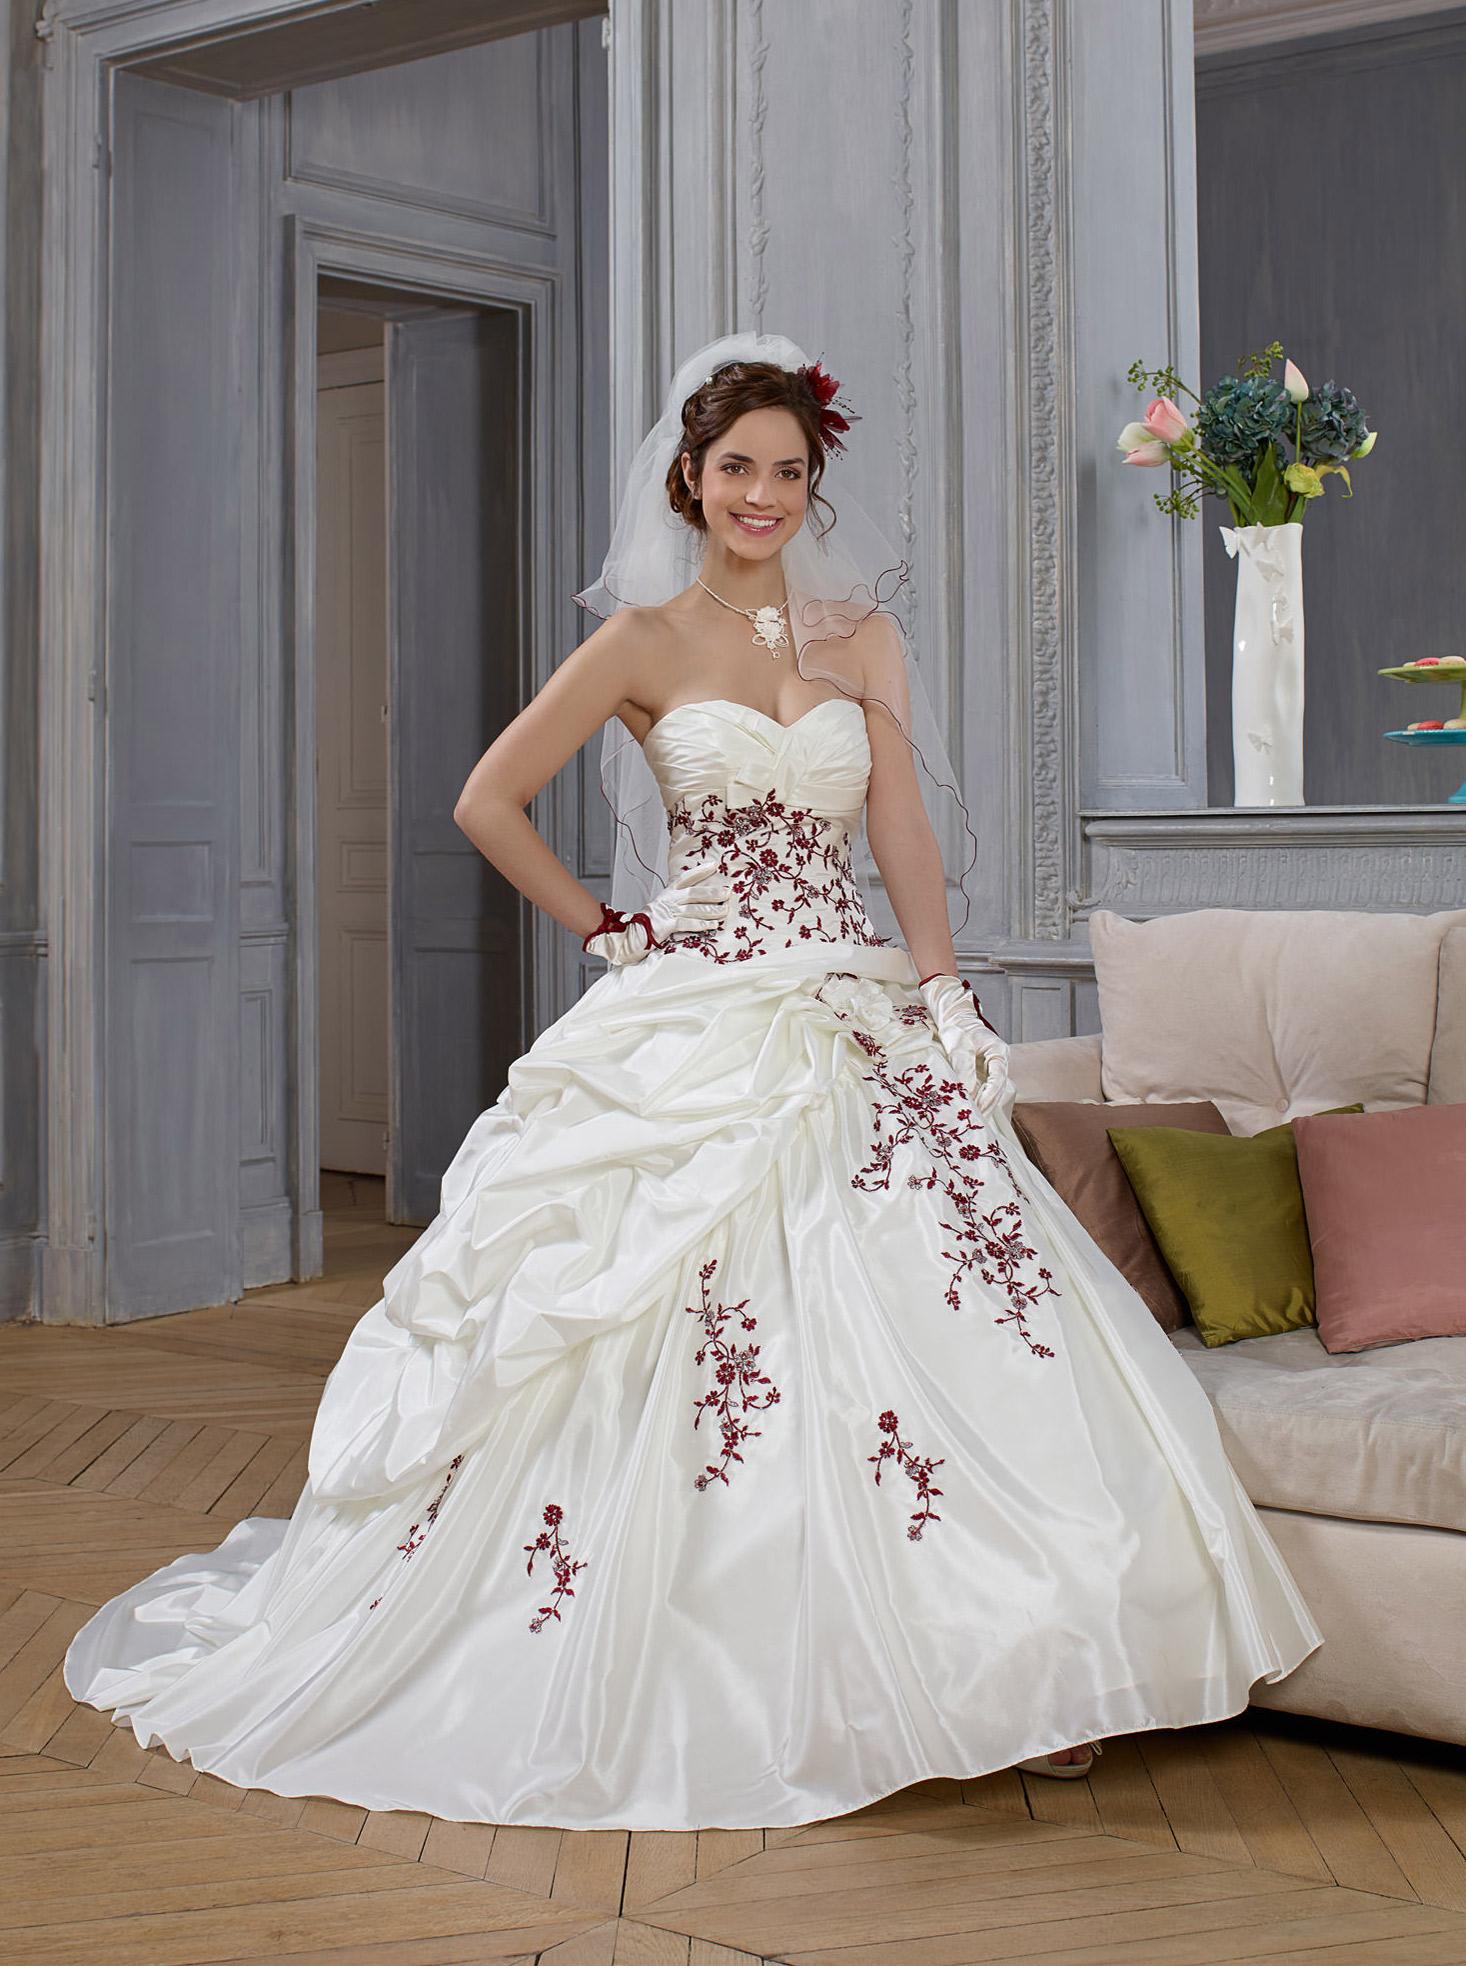 mariage 549 99 robe de mariée elixir point mariage 489 99 robe de ...